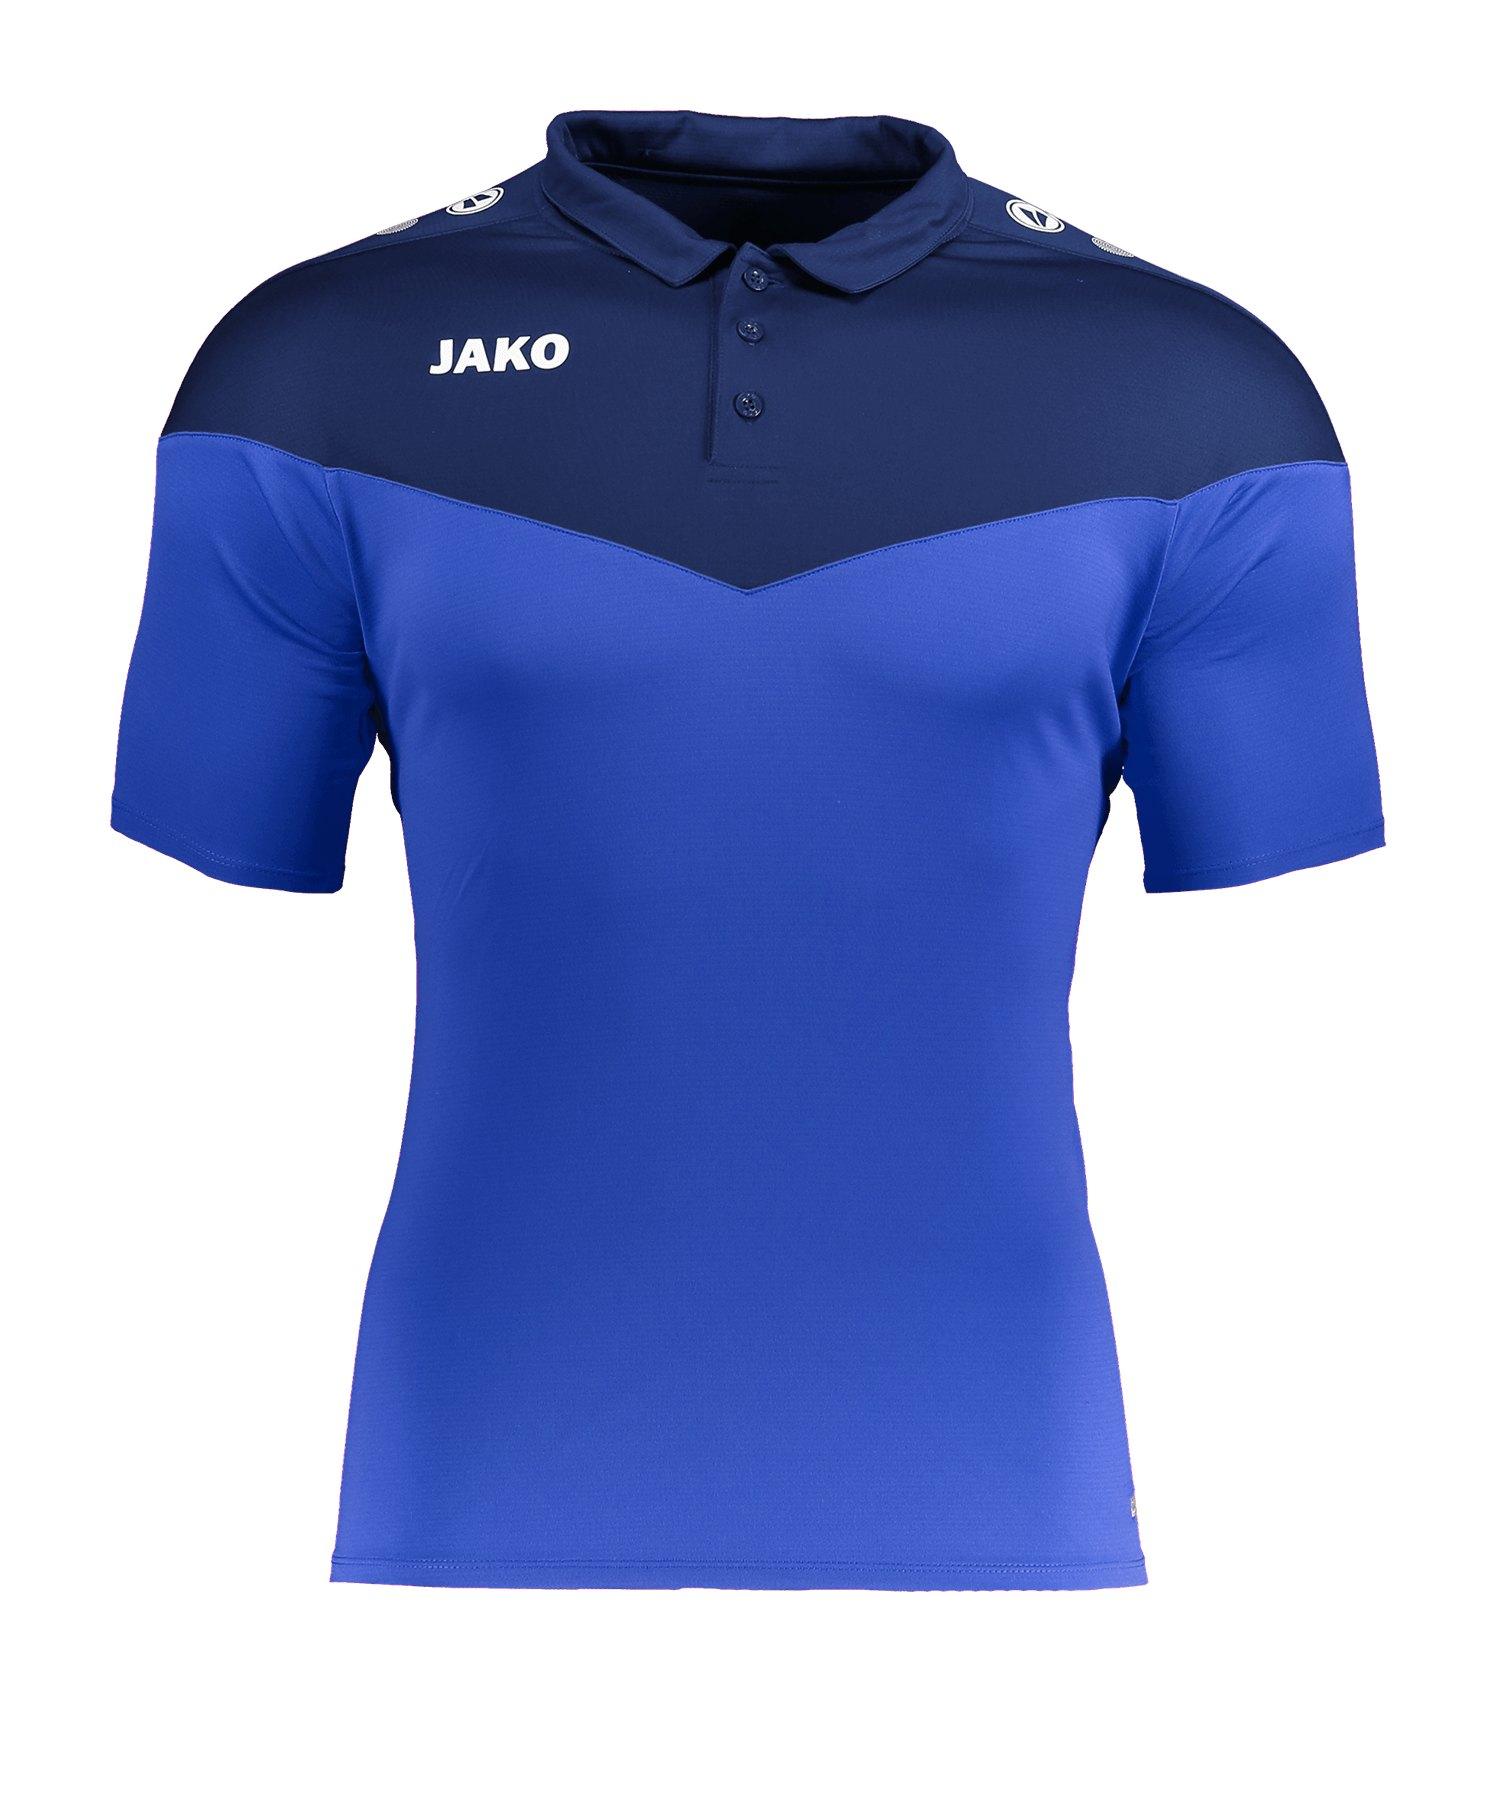 Jako Champ 2.0 Poloshirt Damen Blau F49 - blau